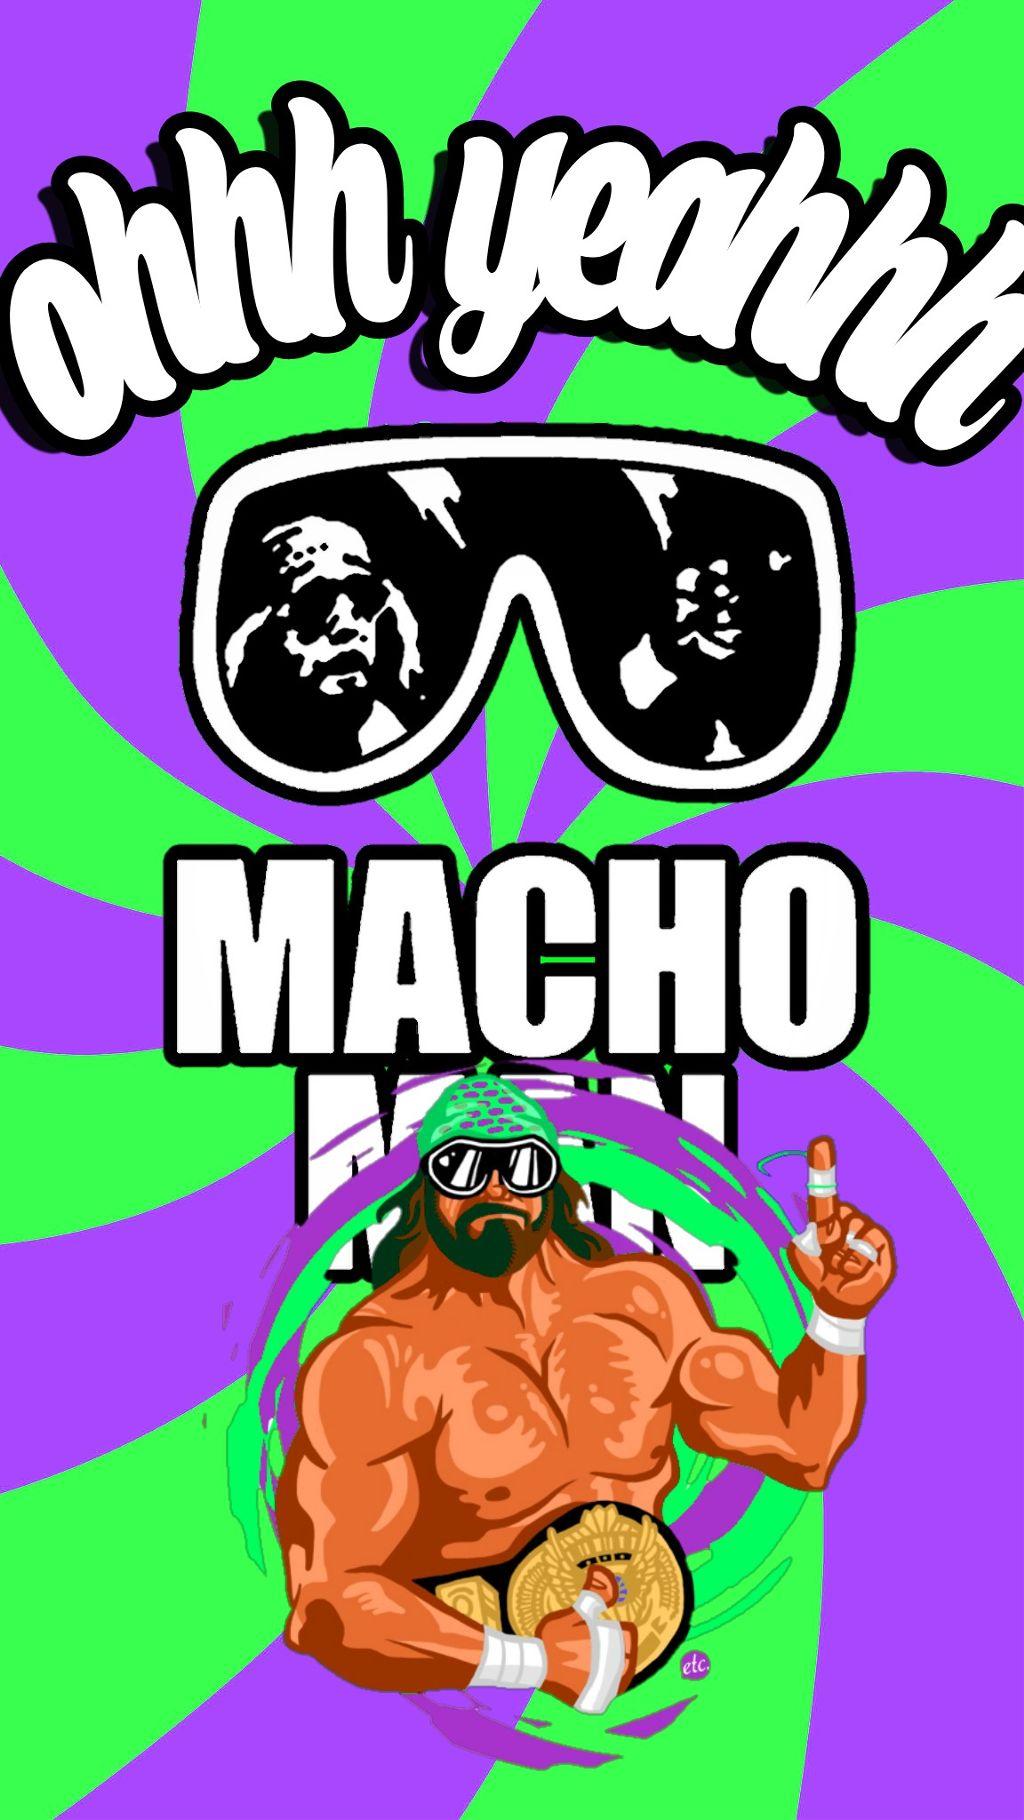 Macho Man Wallpaper For Your Phone Machomanrandysava